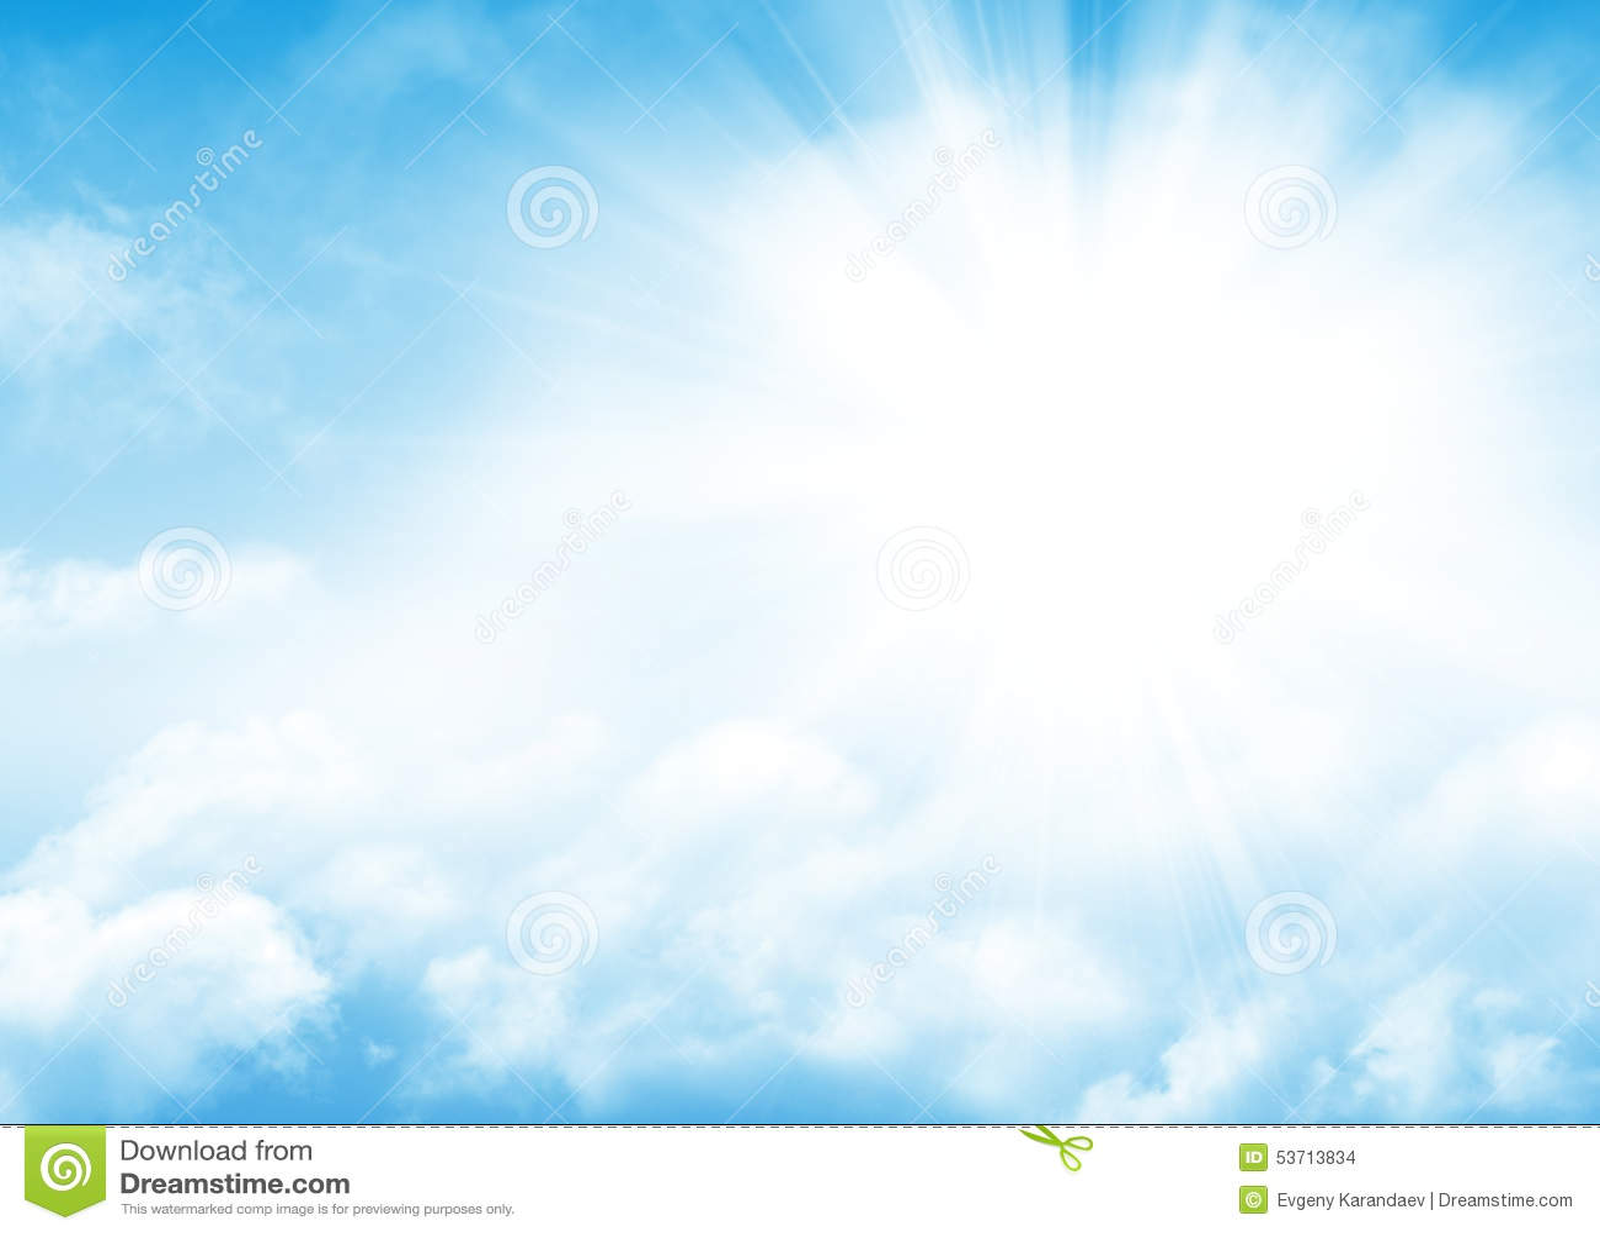 Tolle Blauer Himmel Lebenslauf Hilfe Bilder - Entry Level Resume ...